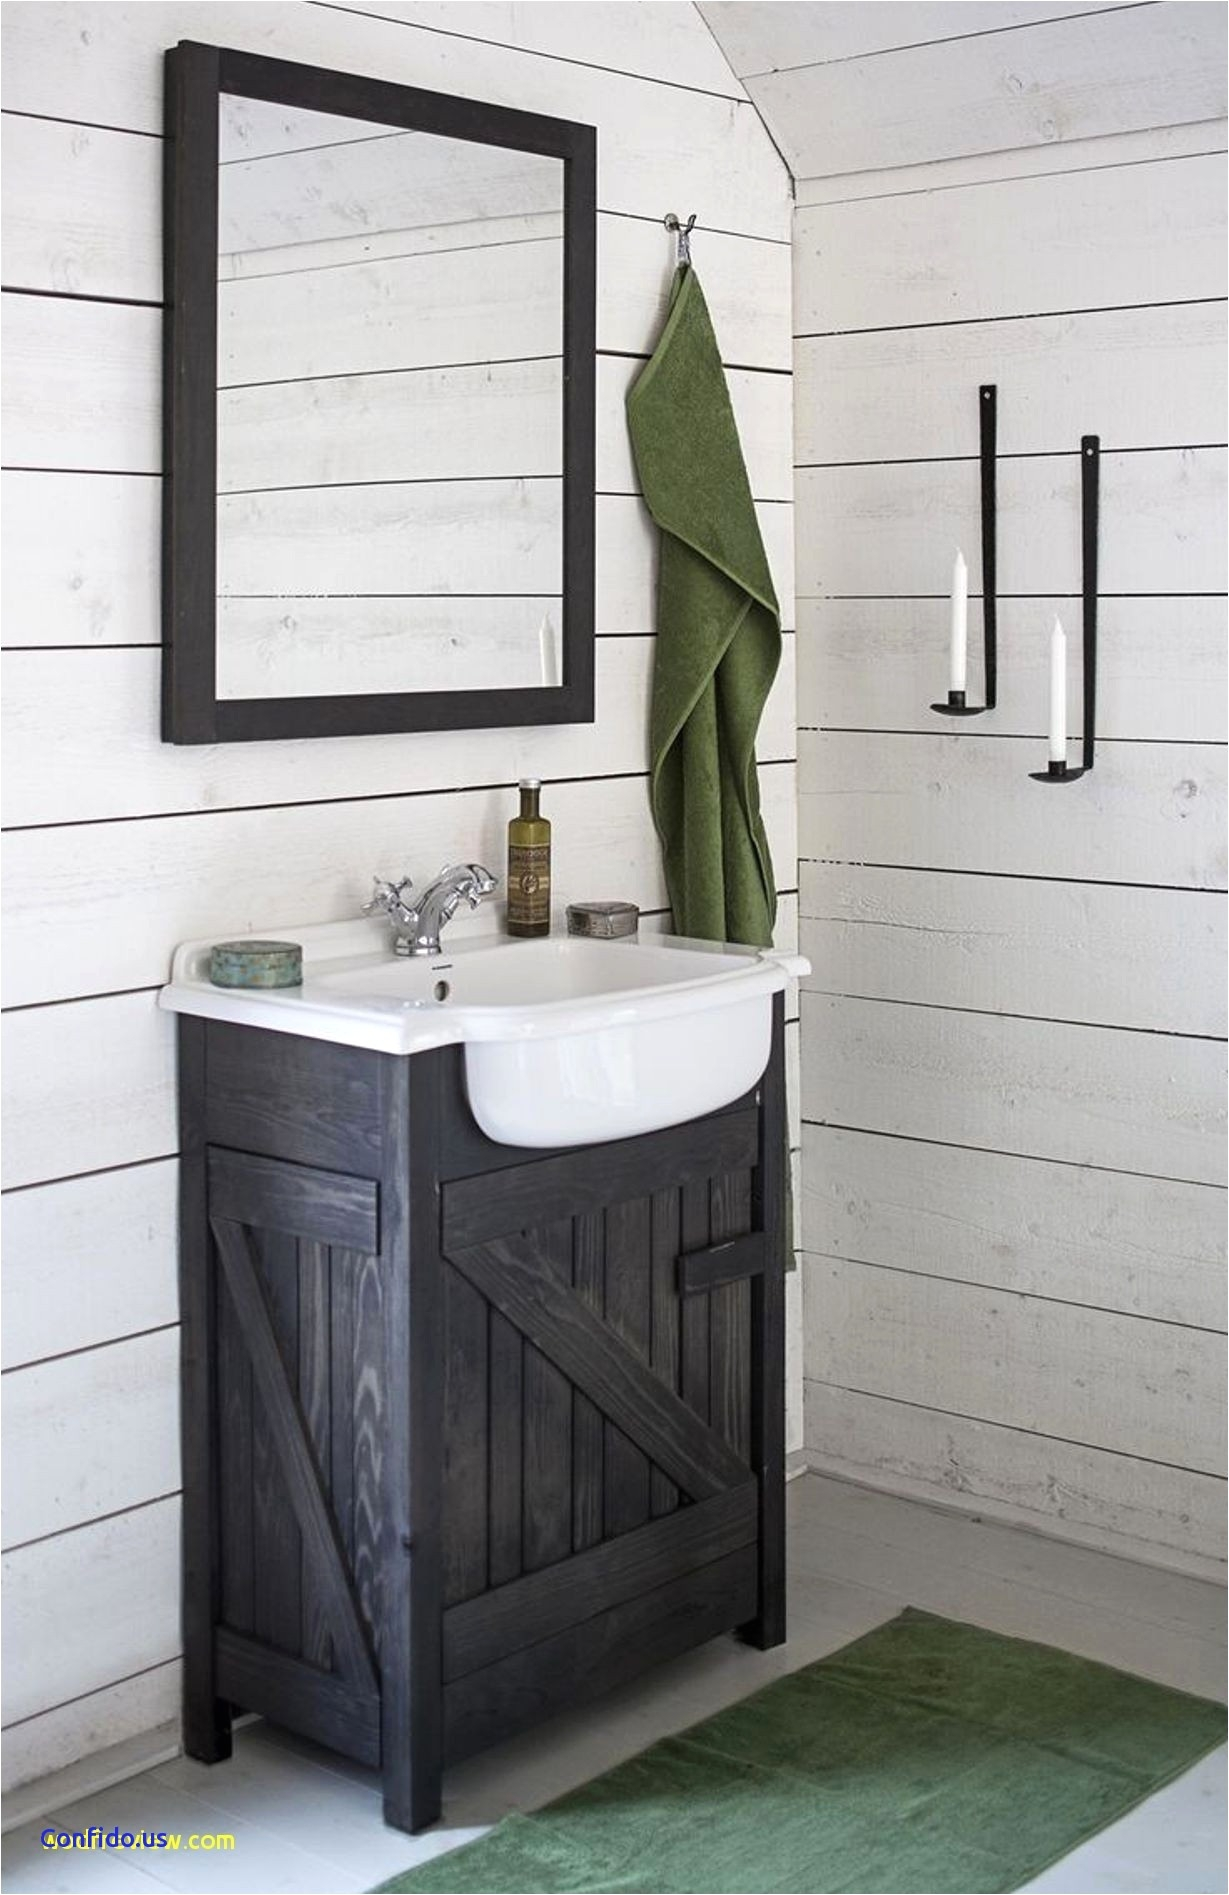 54 27 bathtub elegant inspirational bathroom picture ideas lovely tag toilet ideas 0d best